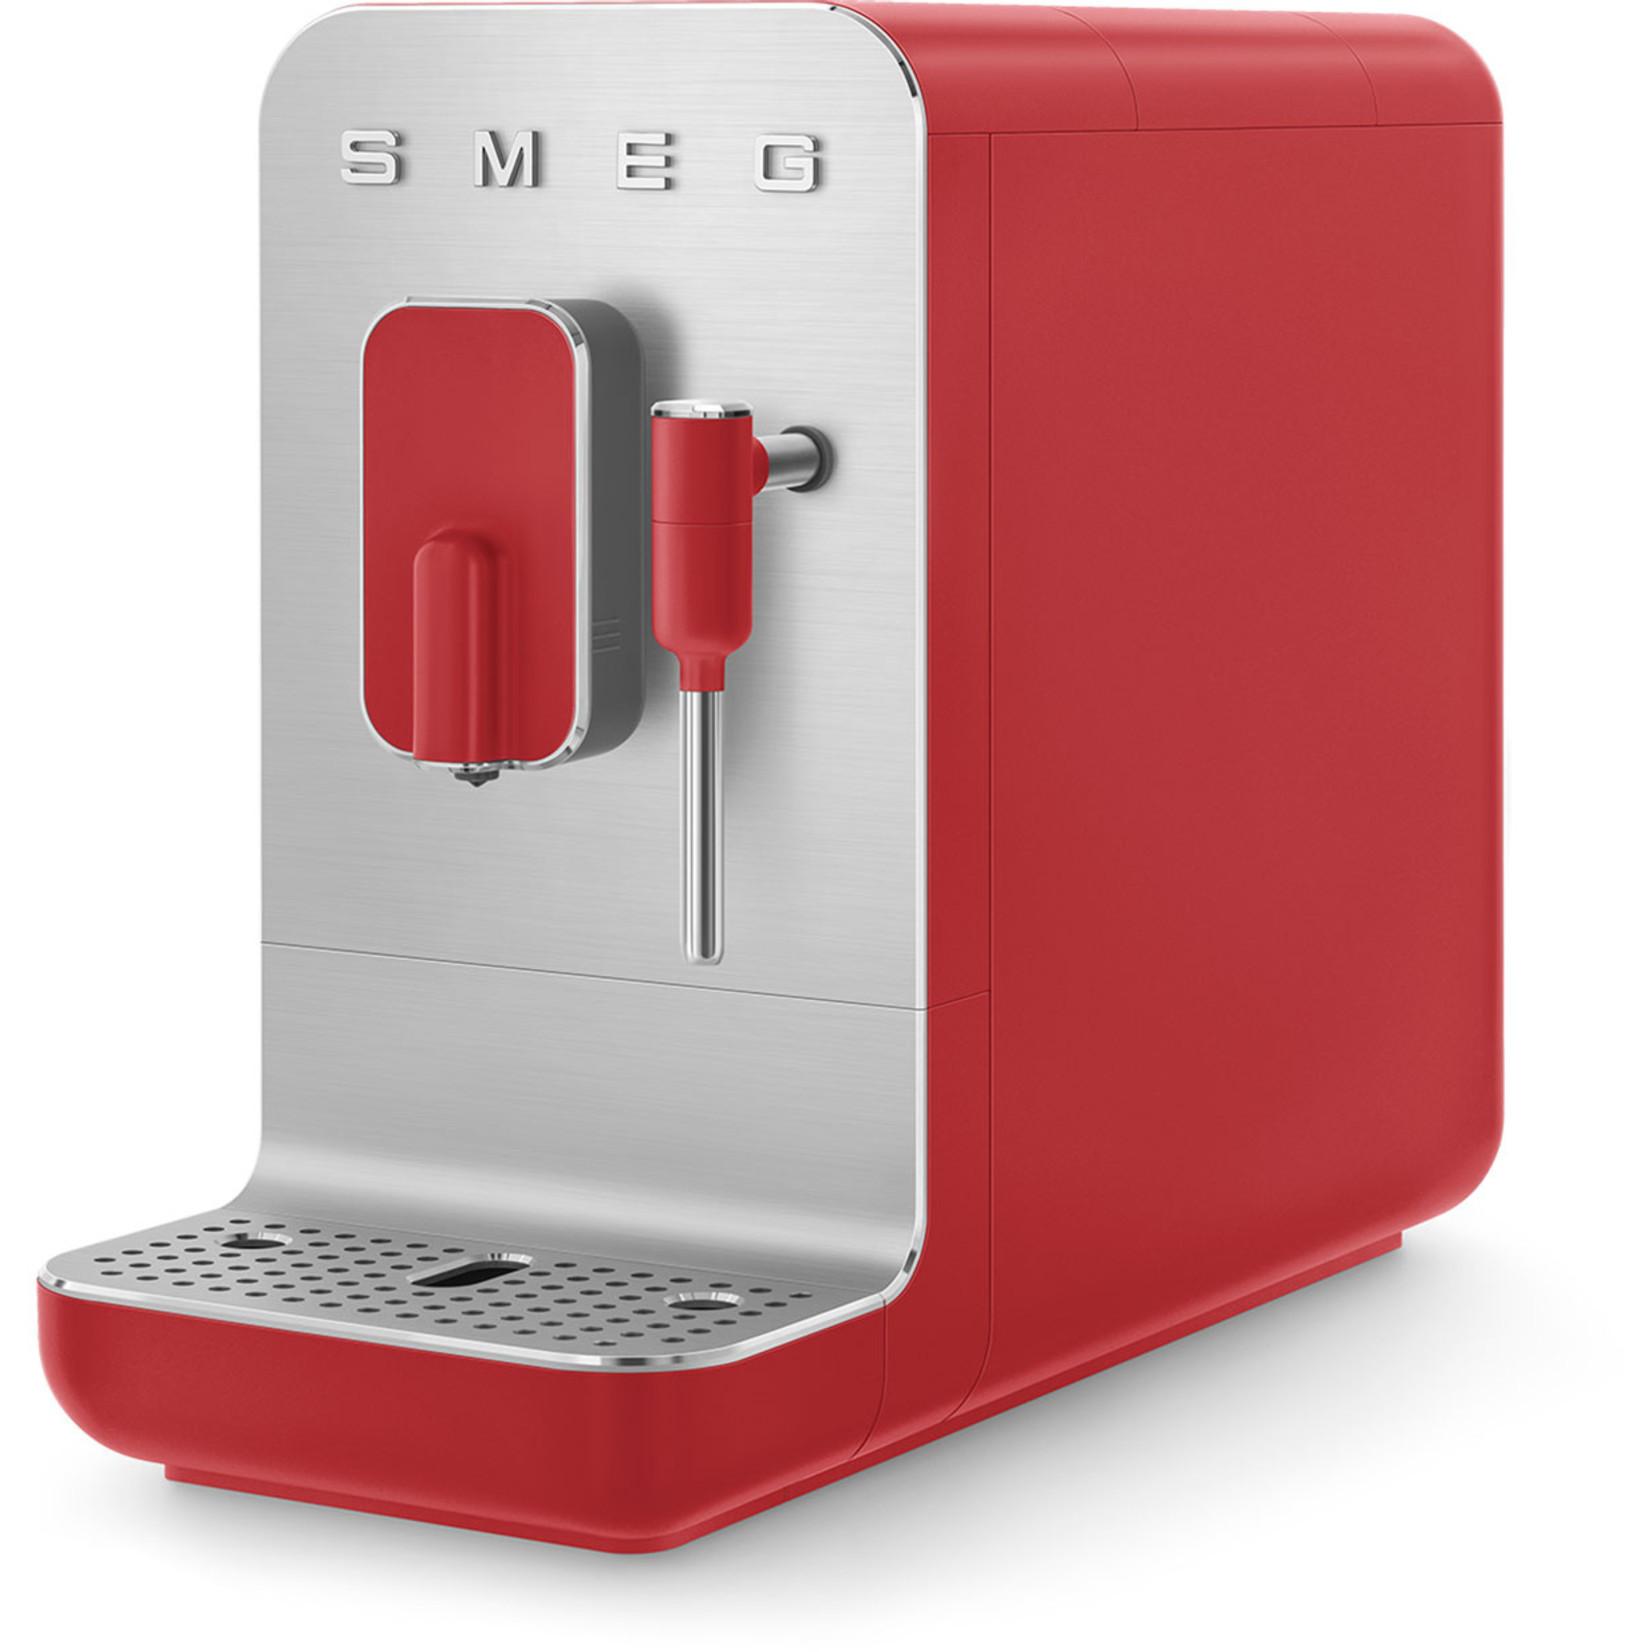 Smeg Smeg espressomachine medium, mat rood, met stoomfunctie